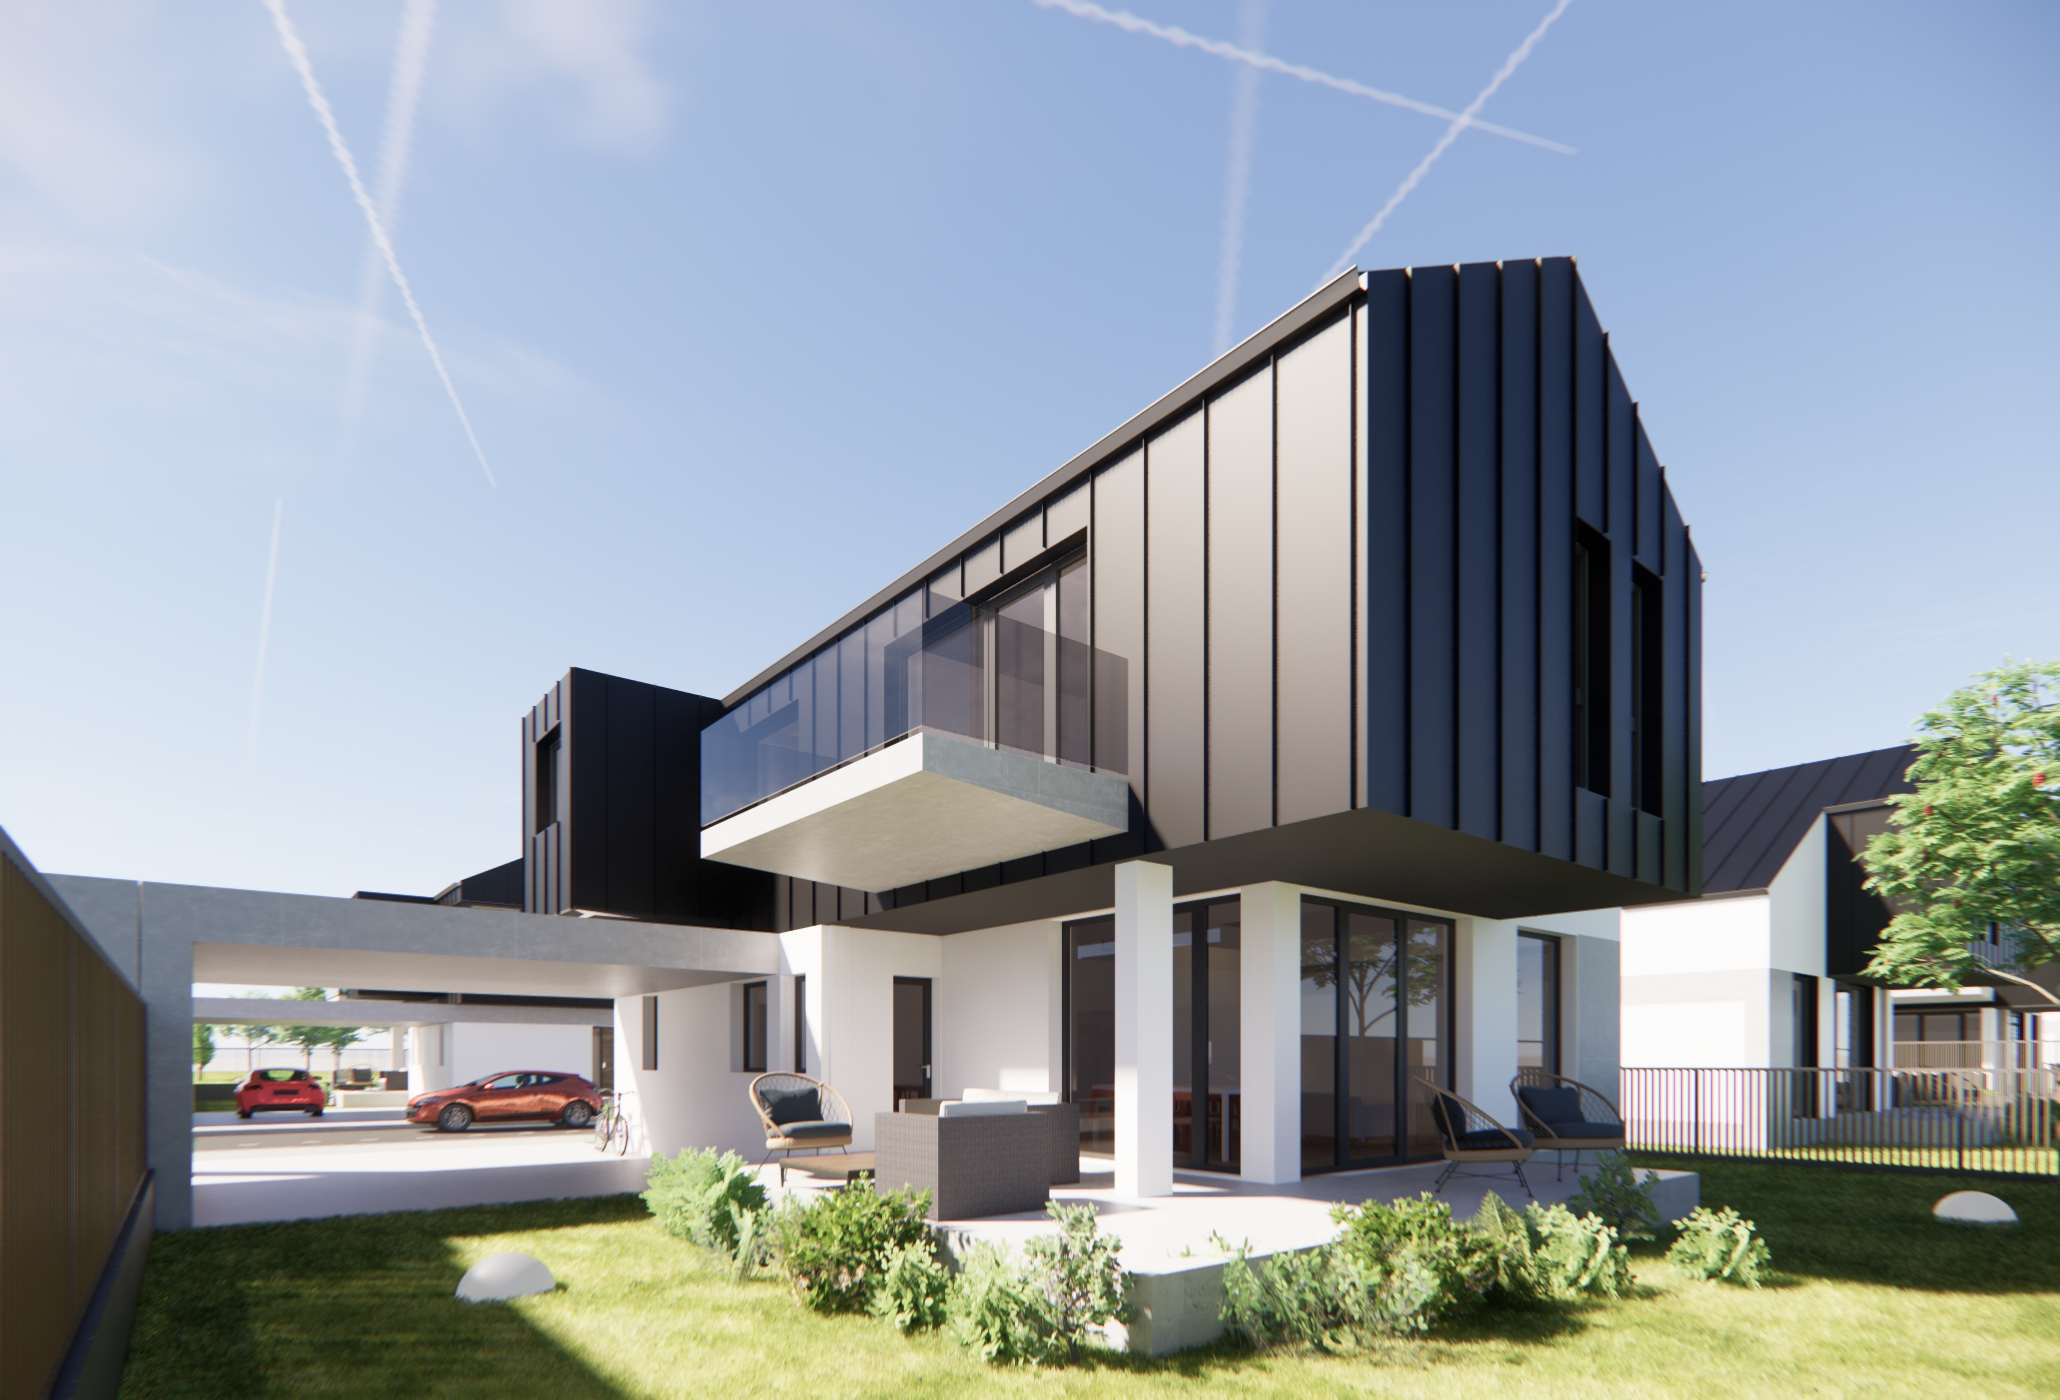 https://nbc-arhitect.ro/wp-content/uploads/2021/02/Enscape_2020-07-28-19-44-29_cam-3.jpg